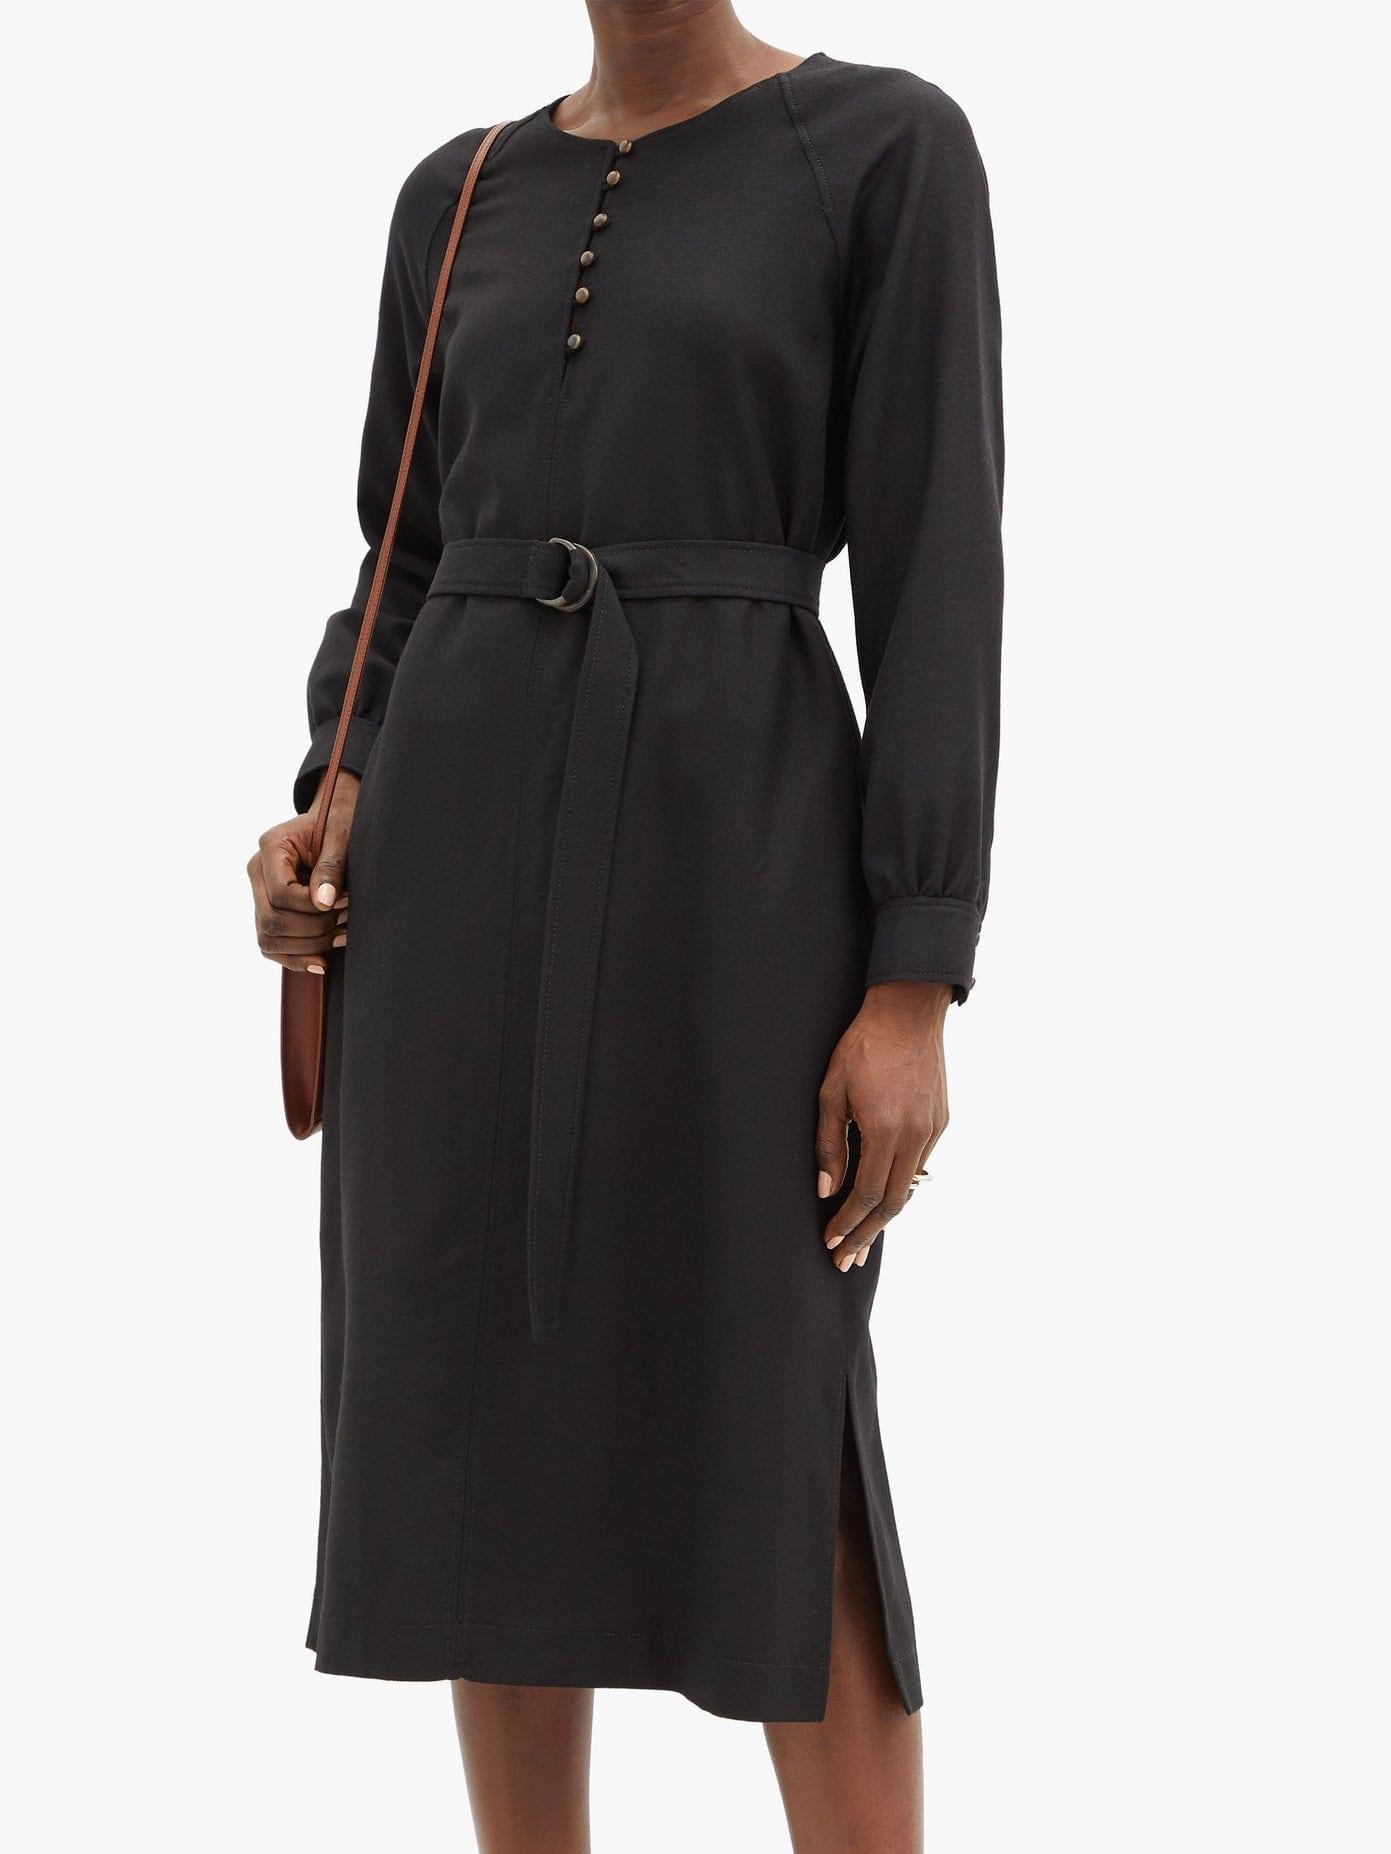 A.P.C. Nicolette Belted Wool-flannel Dress